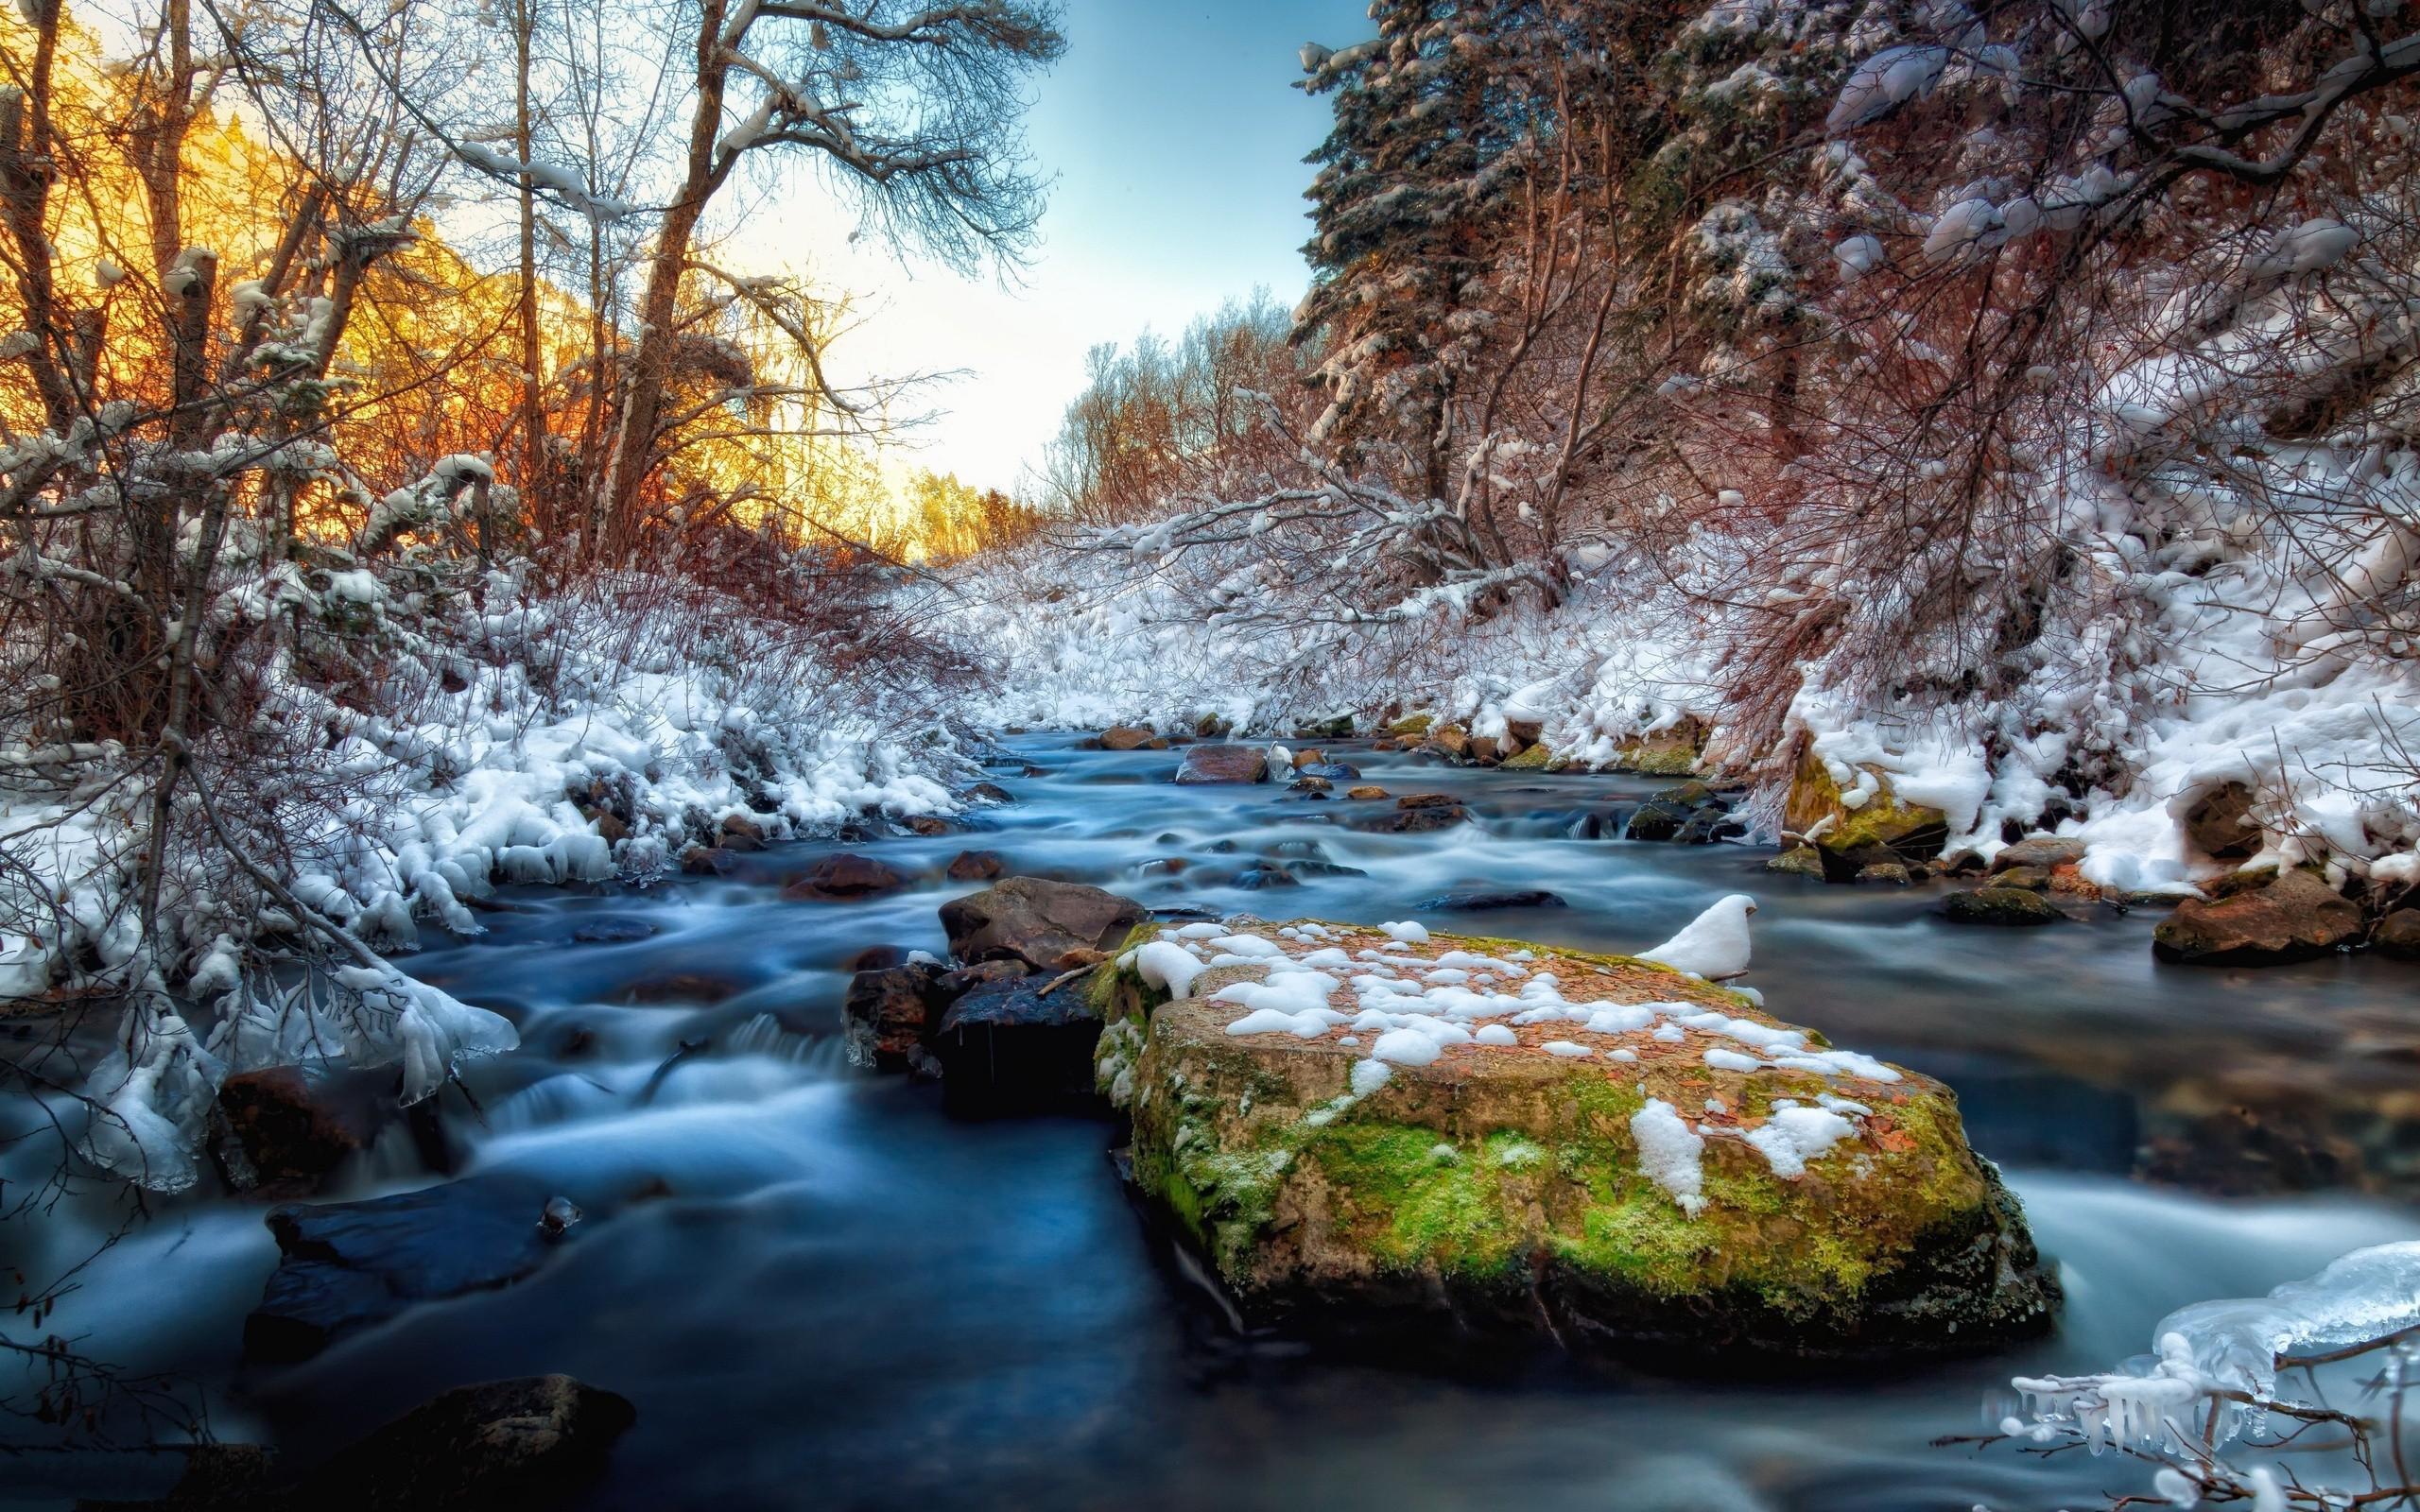 River Rocks Stones Snow Winter hdr wallpaper background 2560x1600